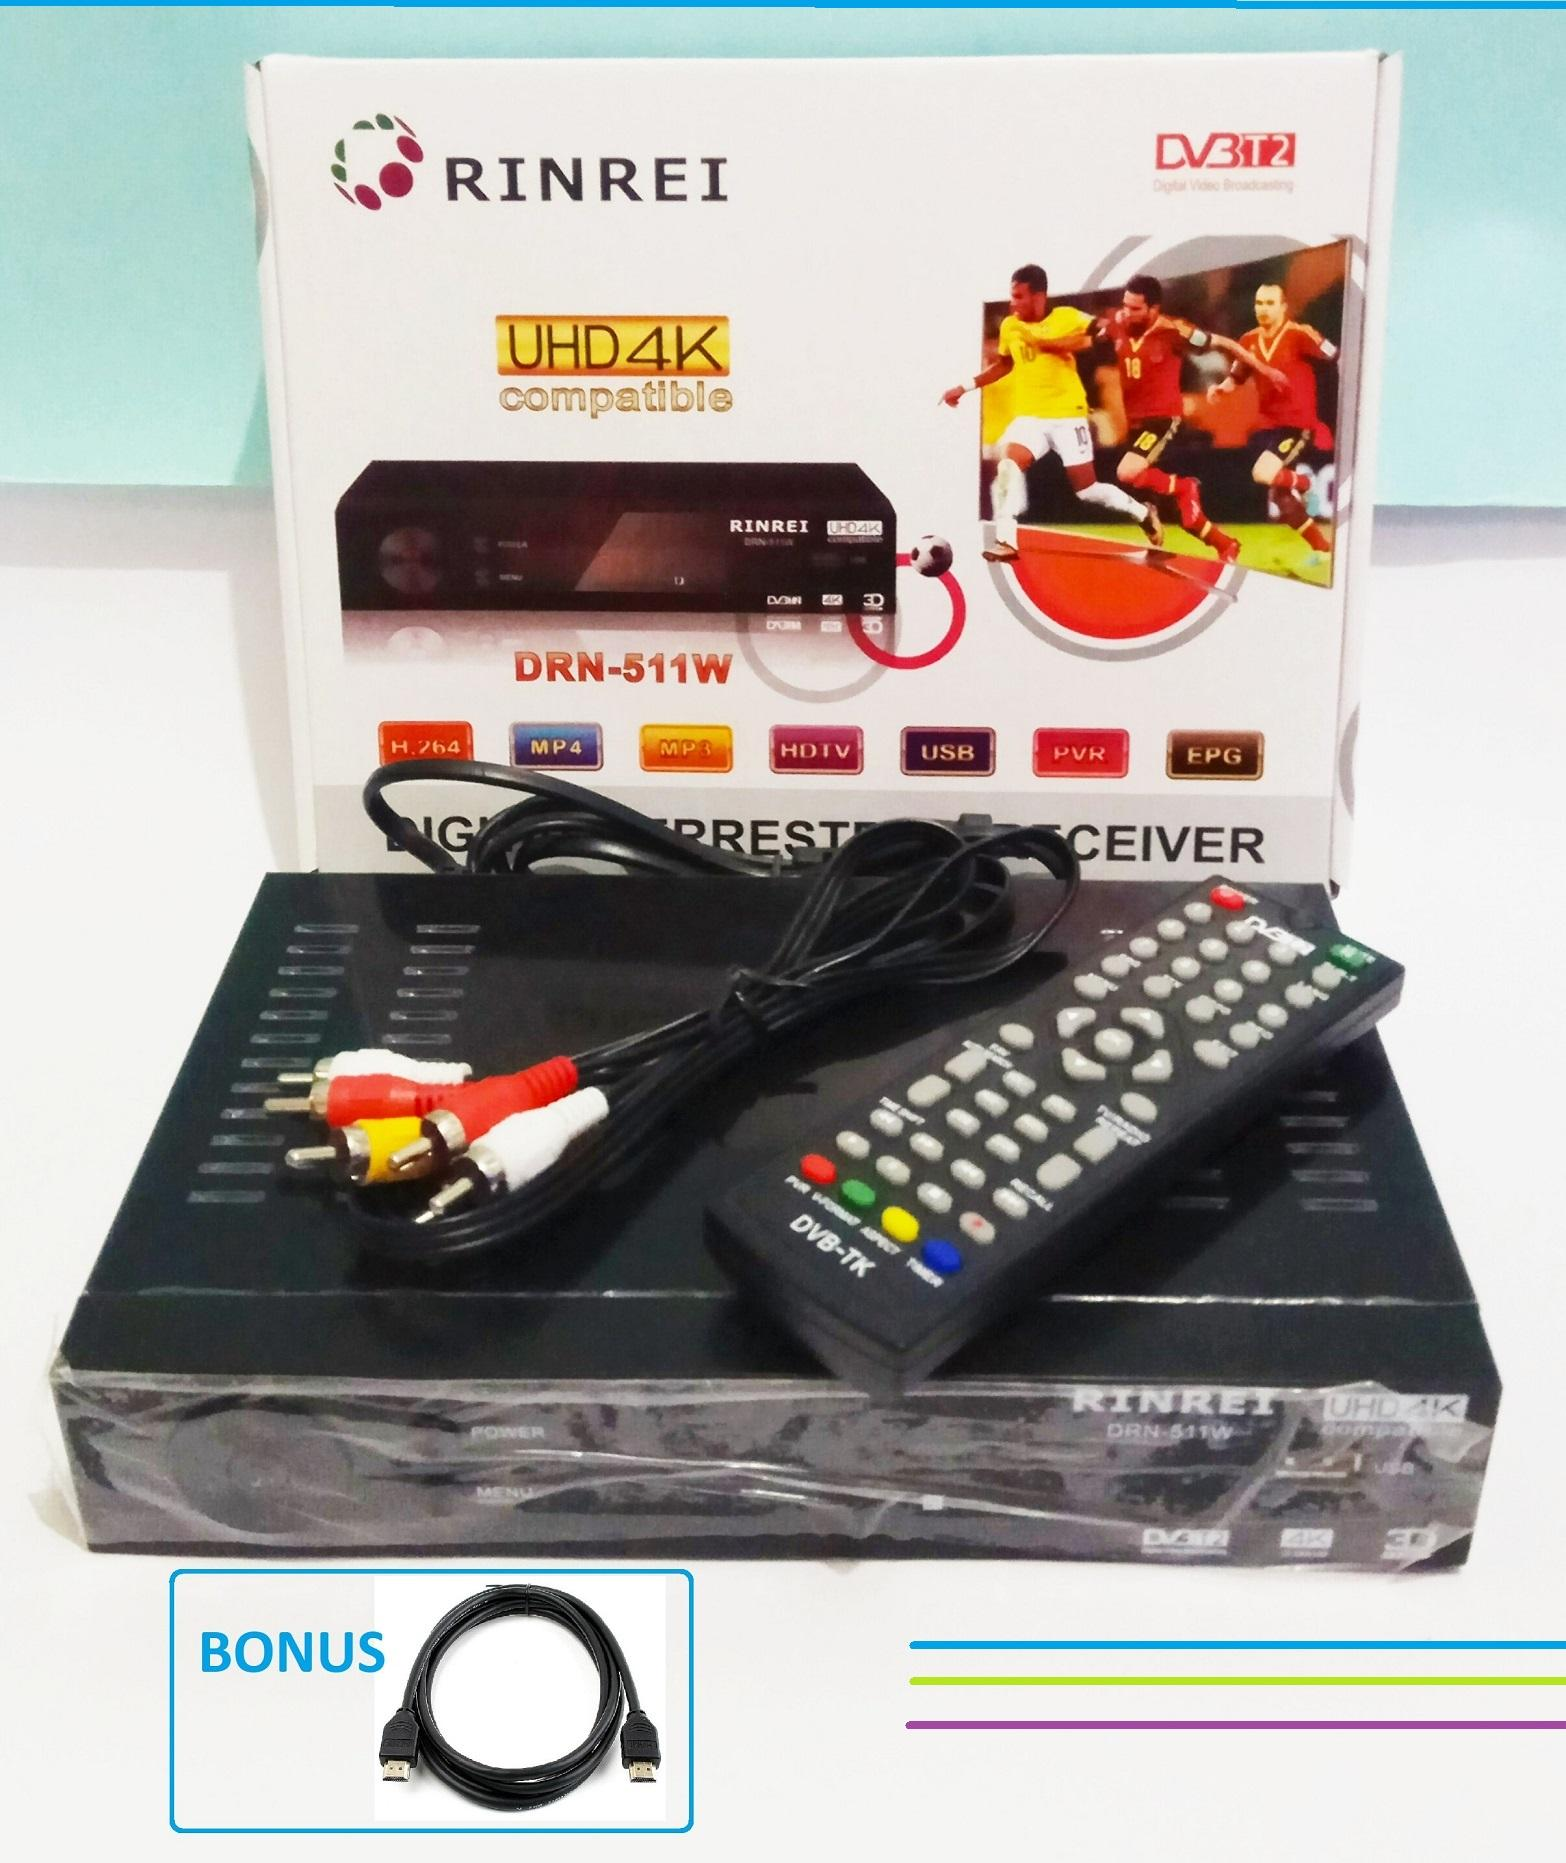 Set Top Box DVB T2 Rinrei DRN 511W UHD 4K STB